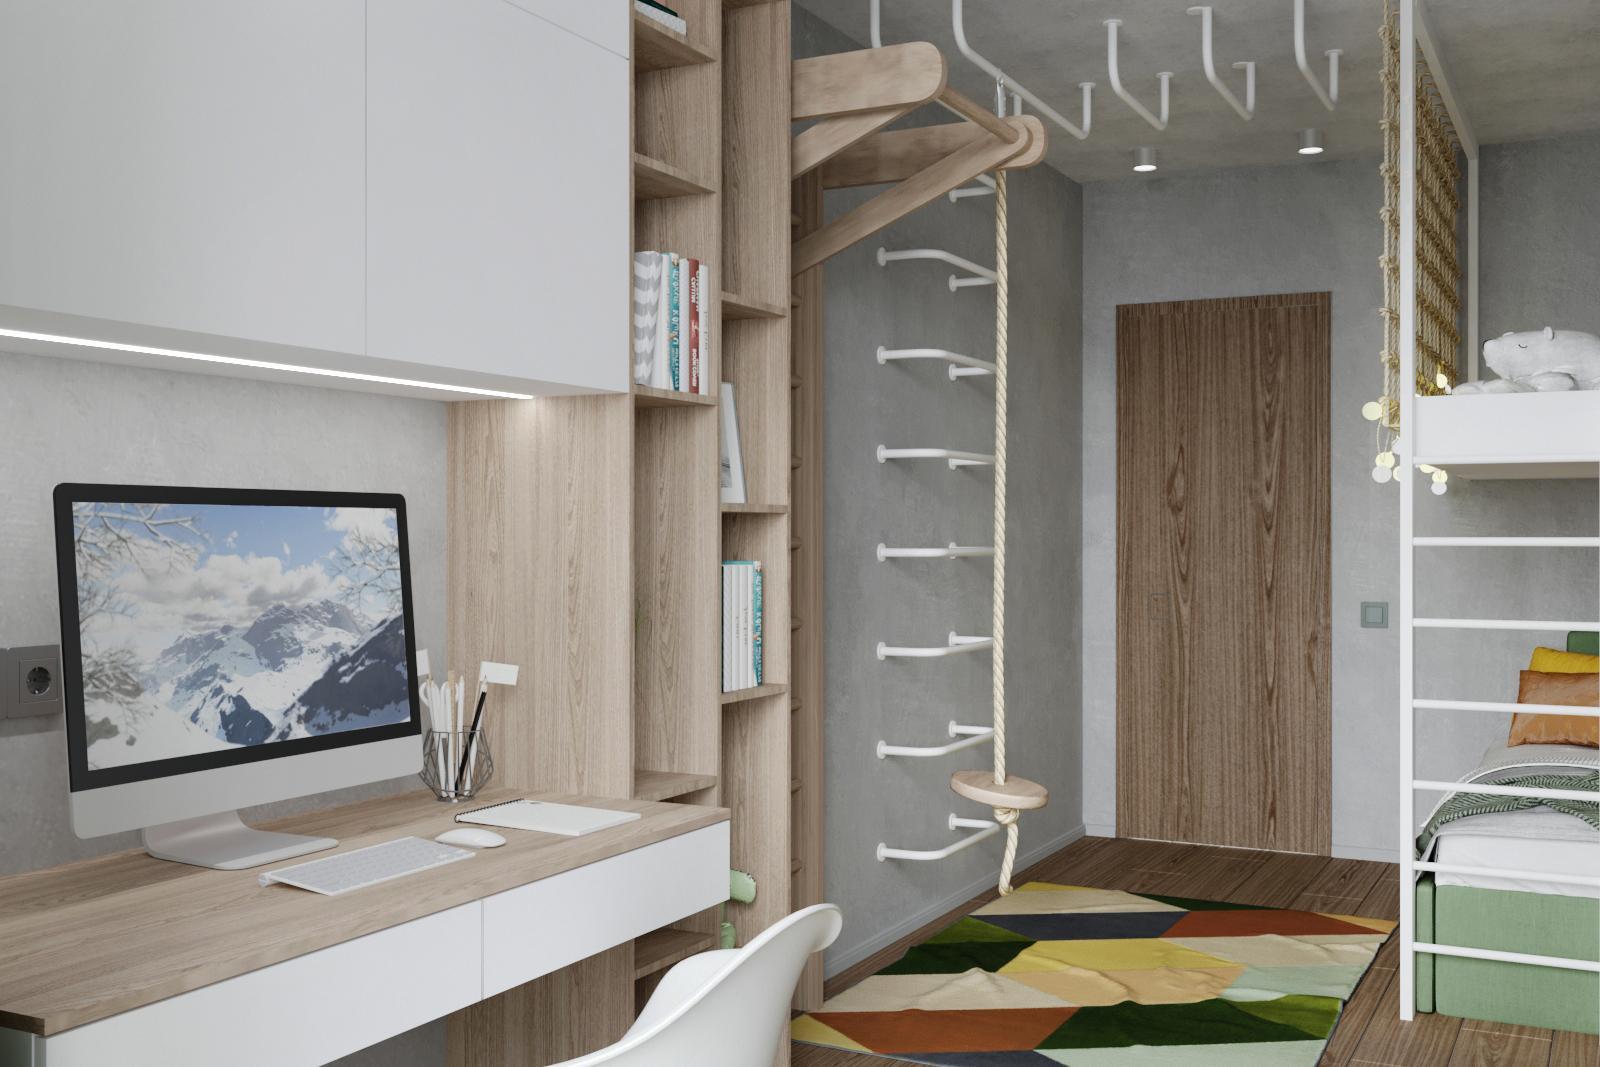 Дизайн квартиры в Панораме - 3